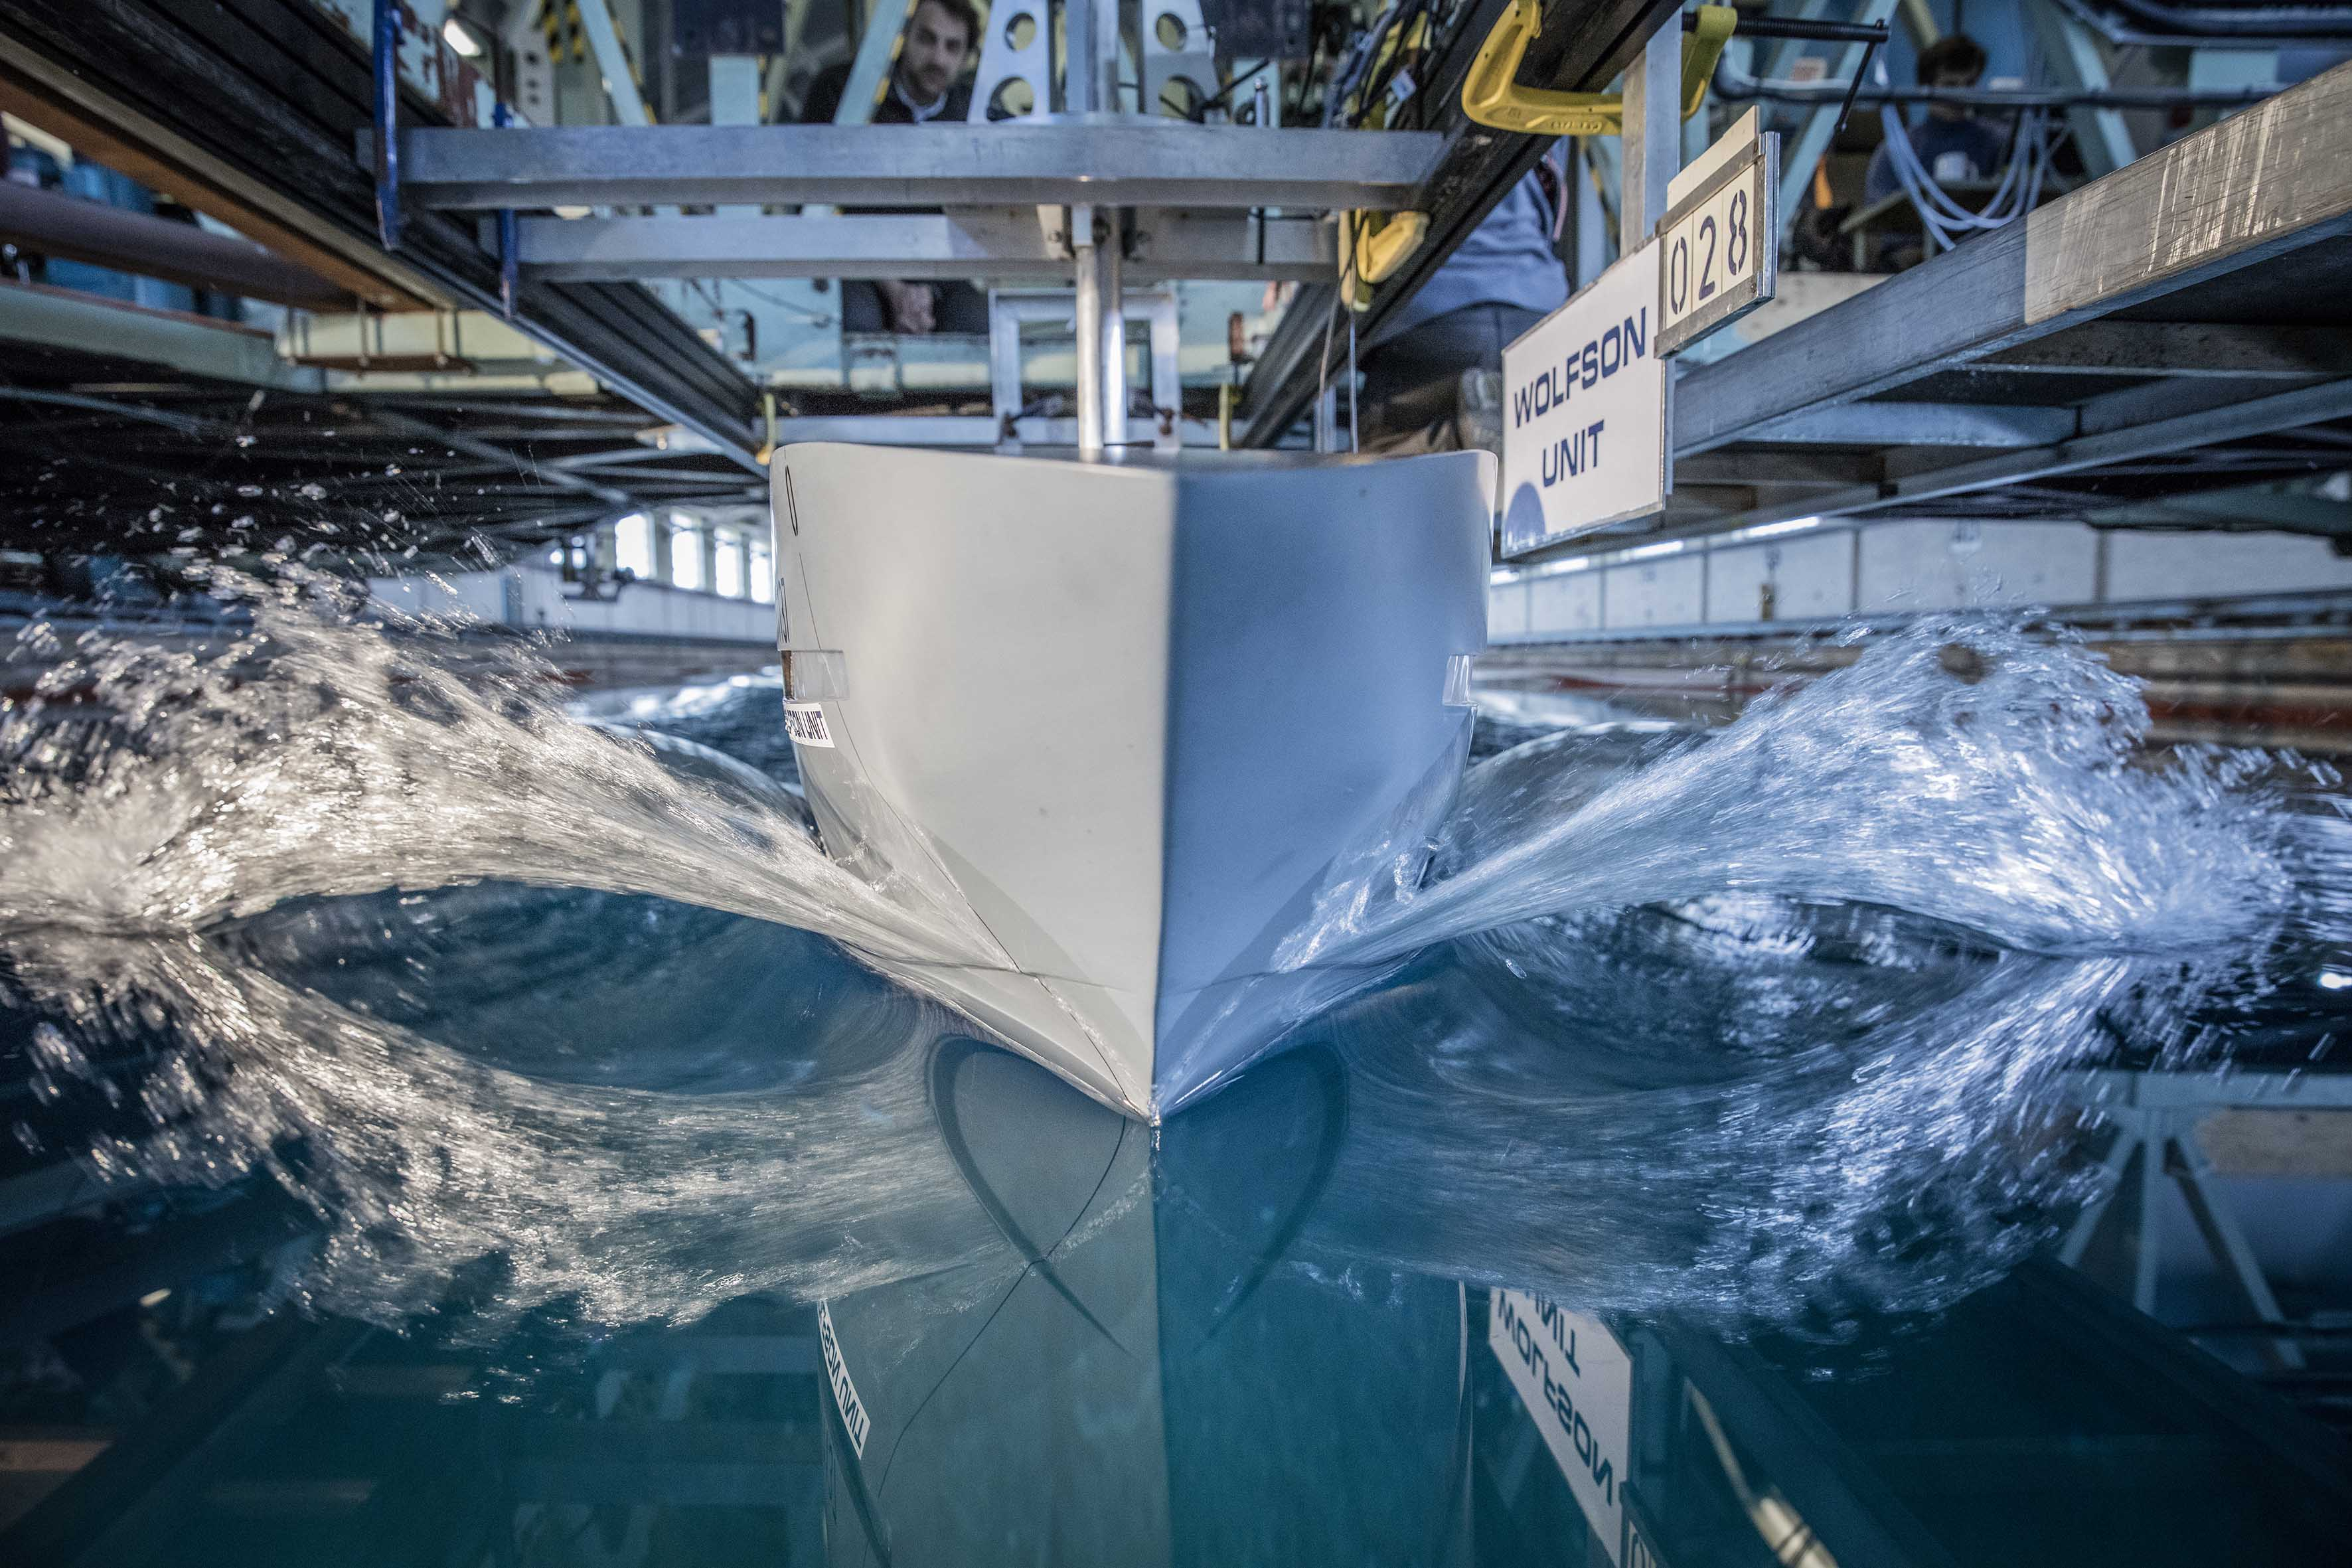 Heesen presents Project Aquamarine in the new 5000 Aluminium Class